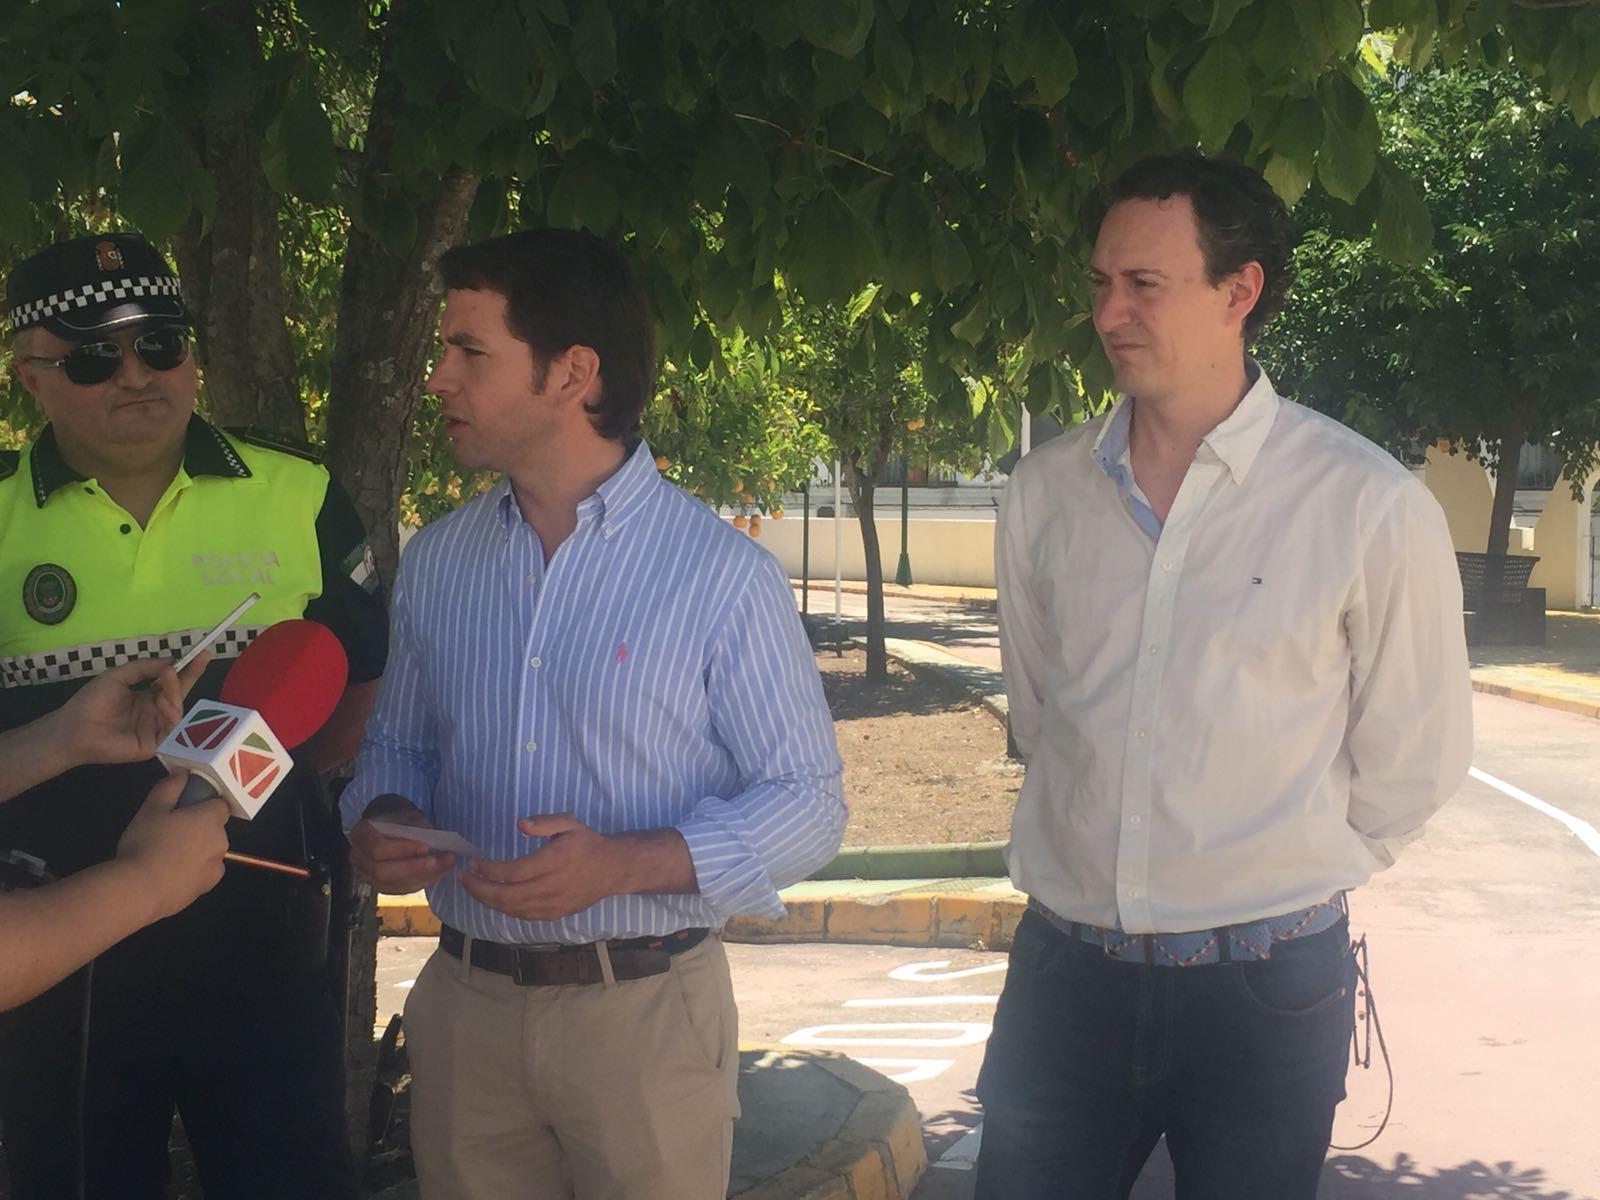 El Parque Infantil de Tráfico es sometido a diferentes obras de mejora por valor de 25.000 euros